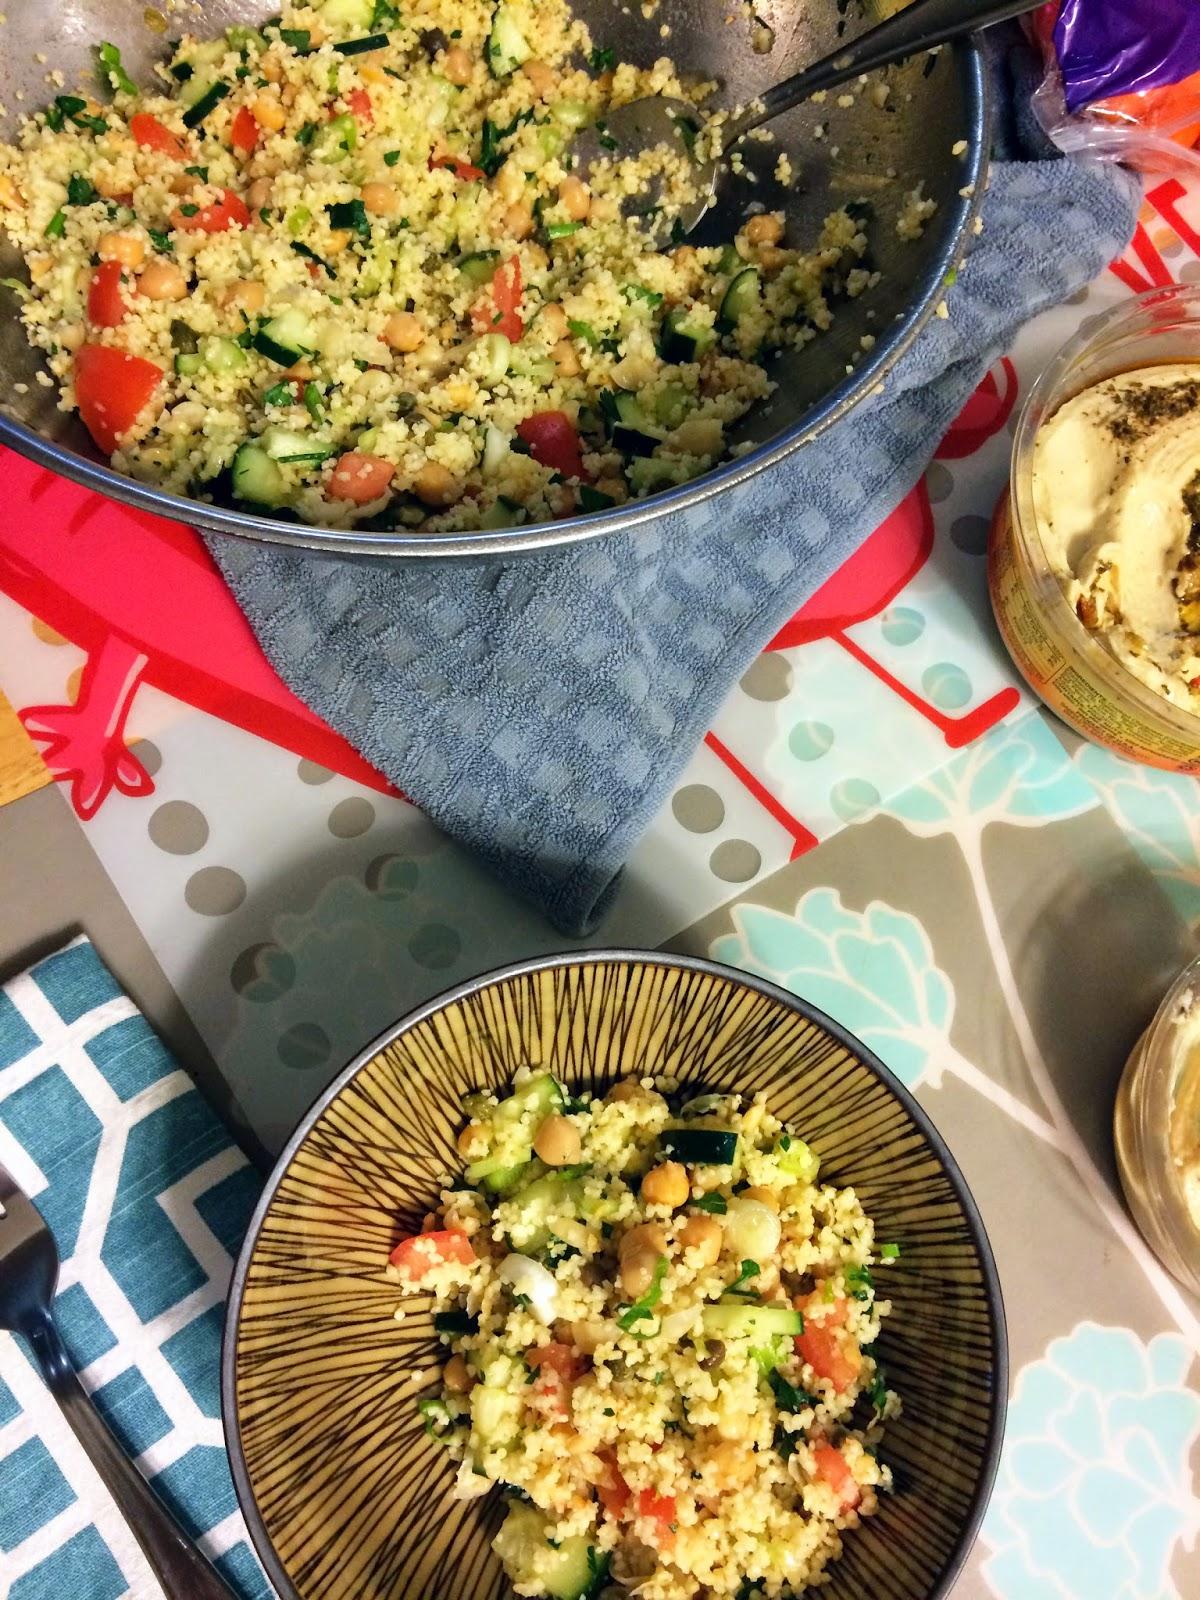 vanishing veggie cookbook creations tabouli of the sea